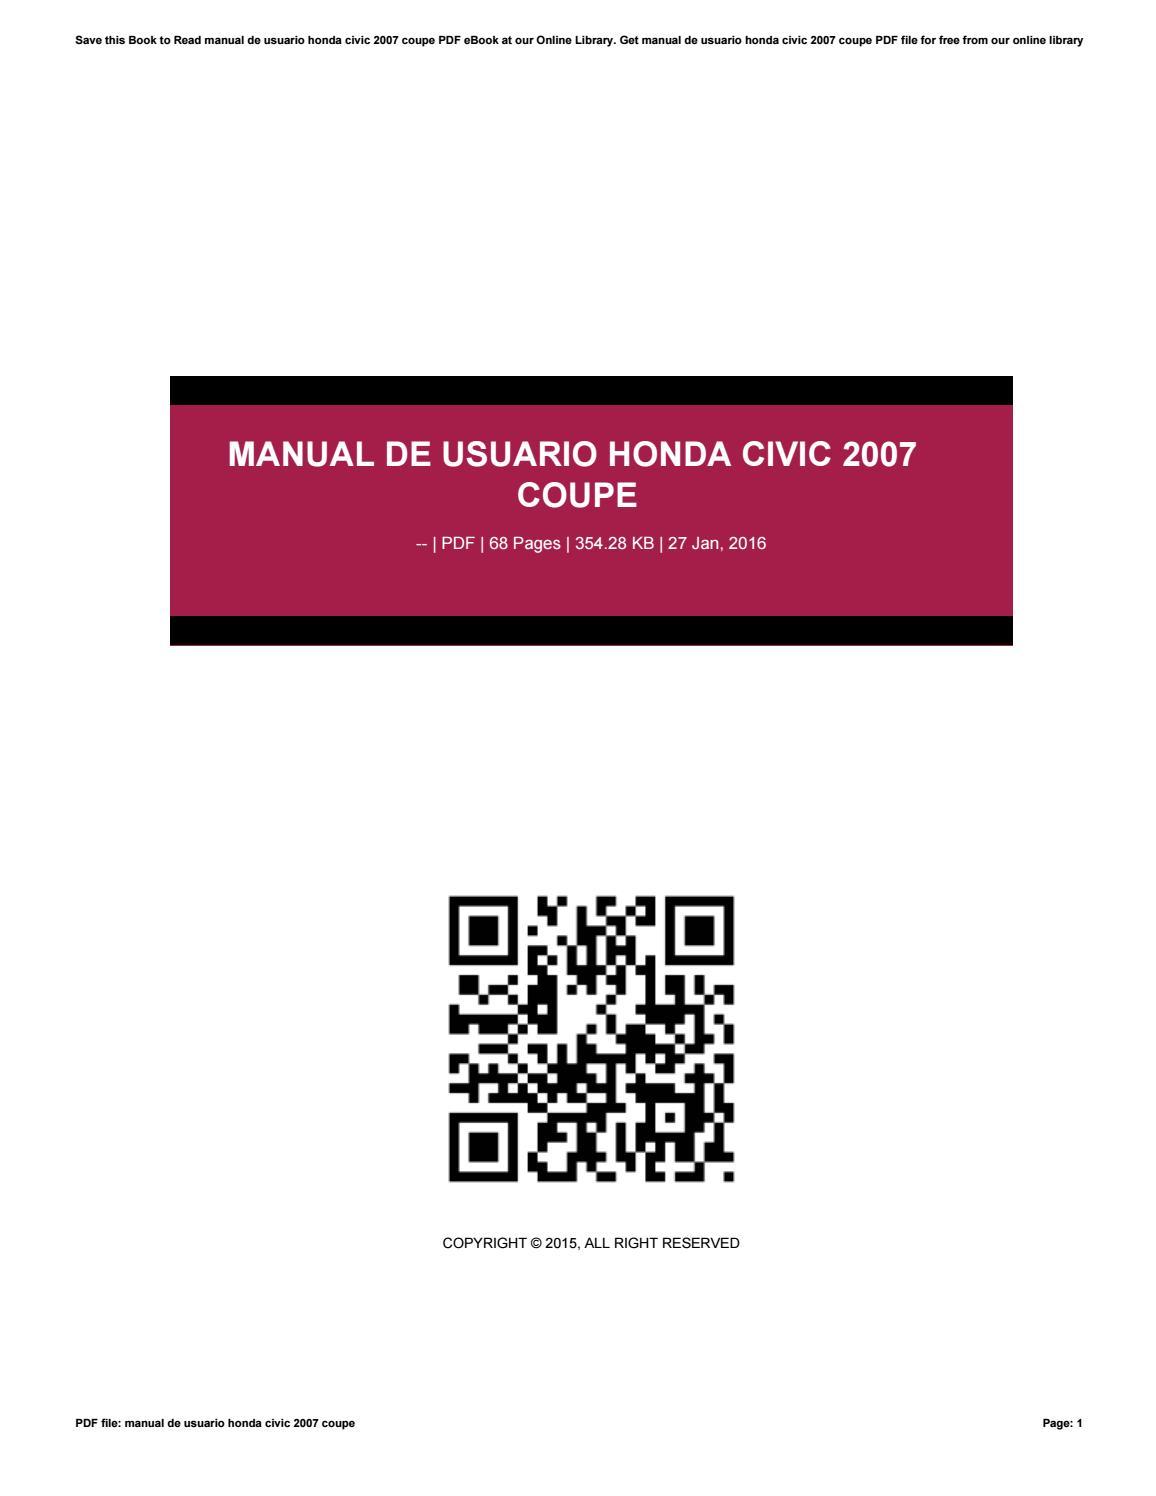 manual de usuario honda civic 2007 coupe by tvchd26 issuu rh issuu com honda civic 2016 manual de usuario honda civic 2001 manual de usuario